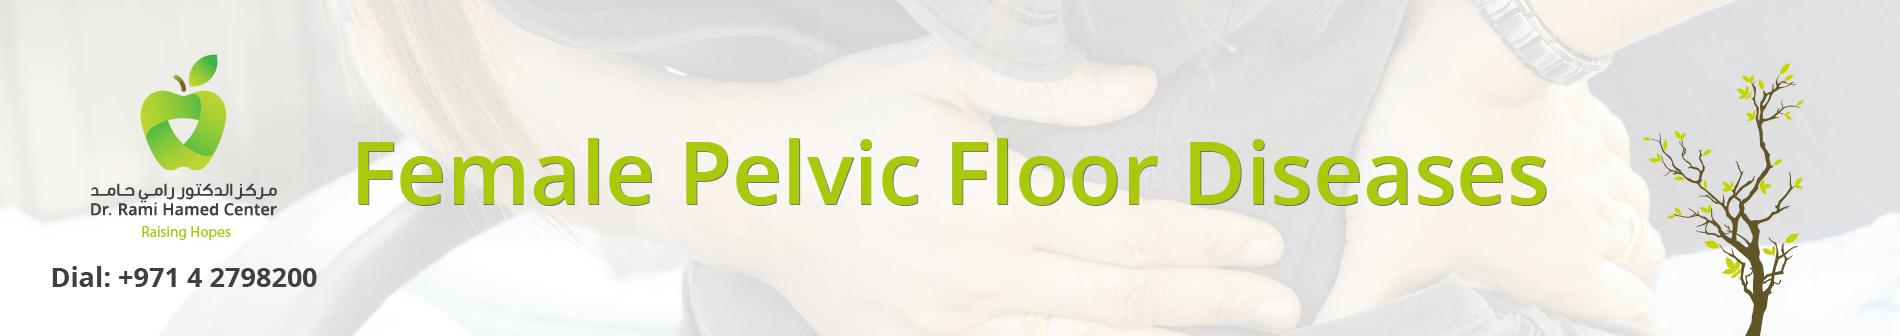 Female Pelvic Floor Diseases